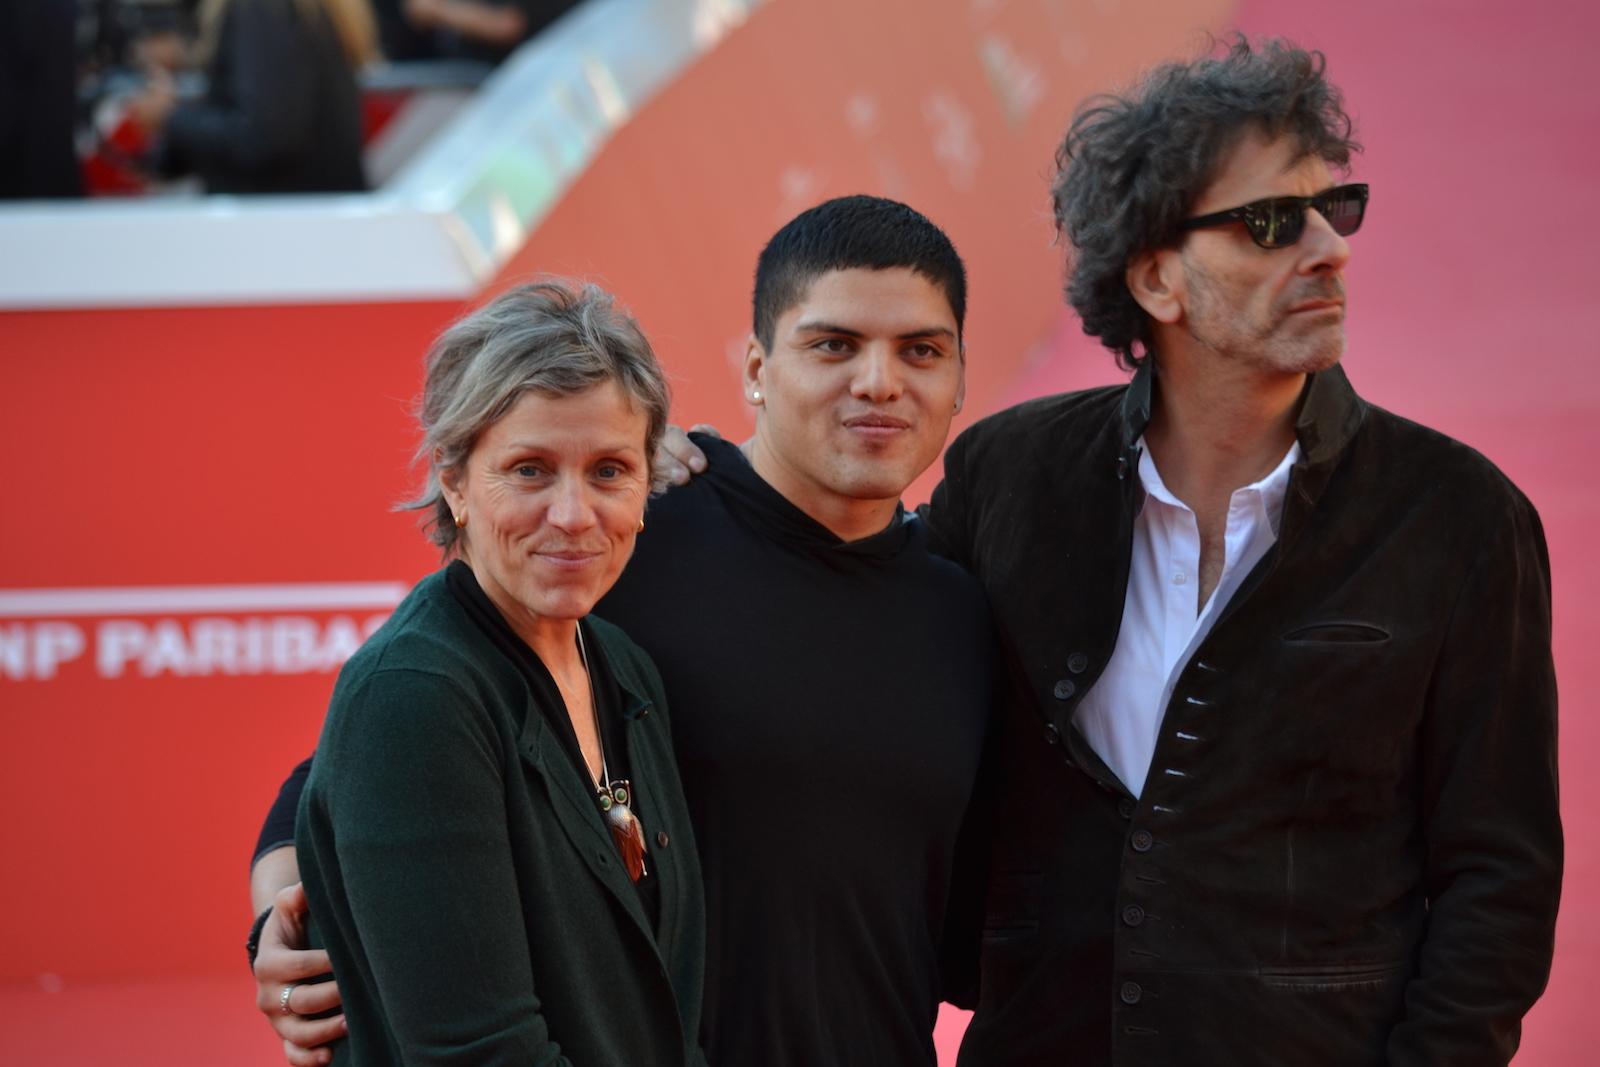 Roma 2015: Frances McDormand e Joel Coen in una foto sul red carpet